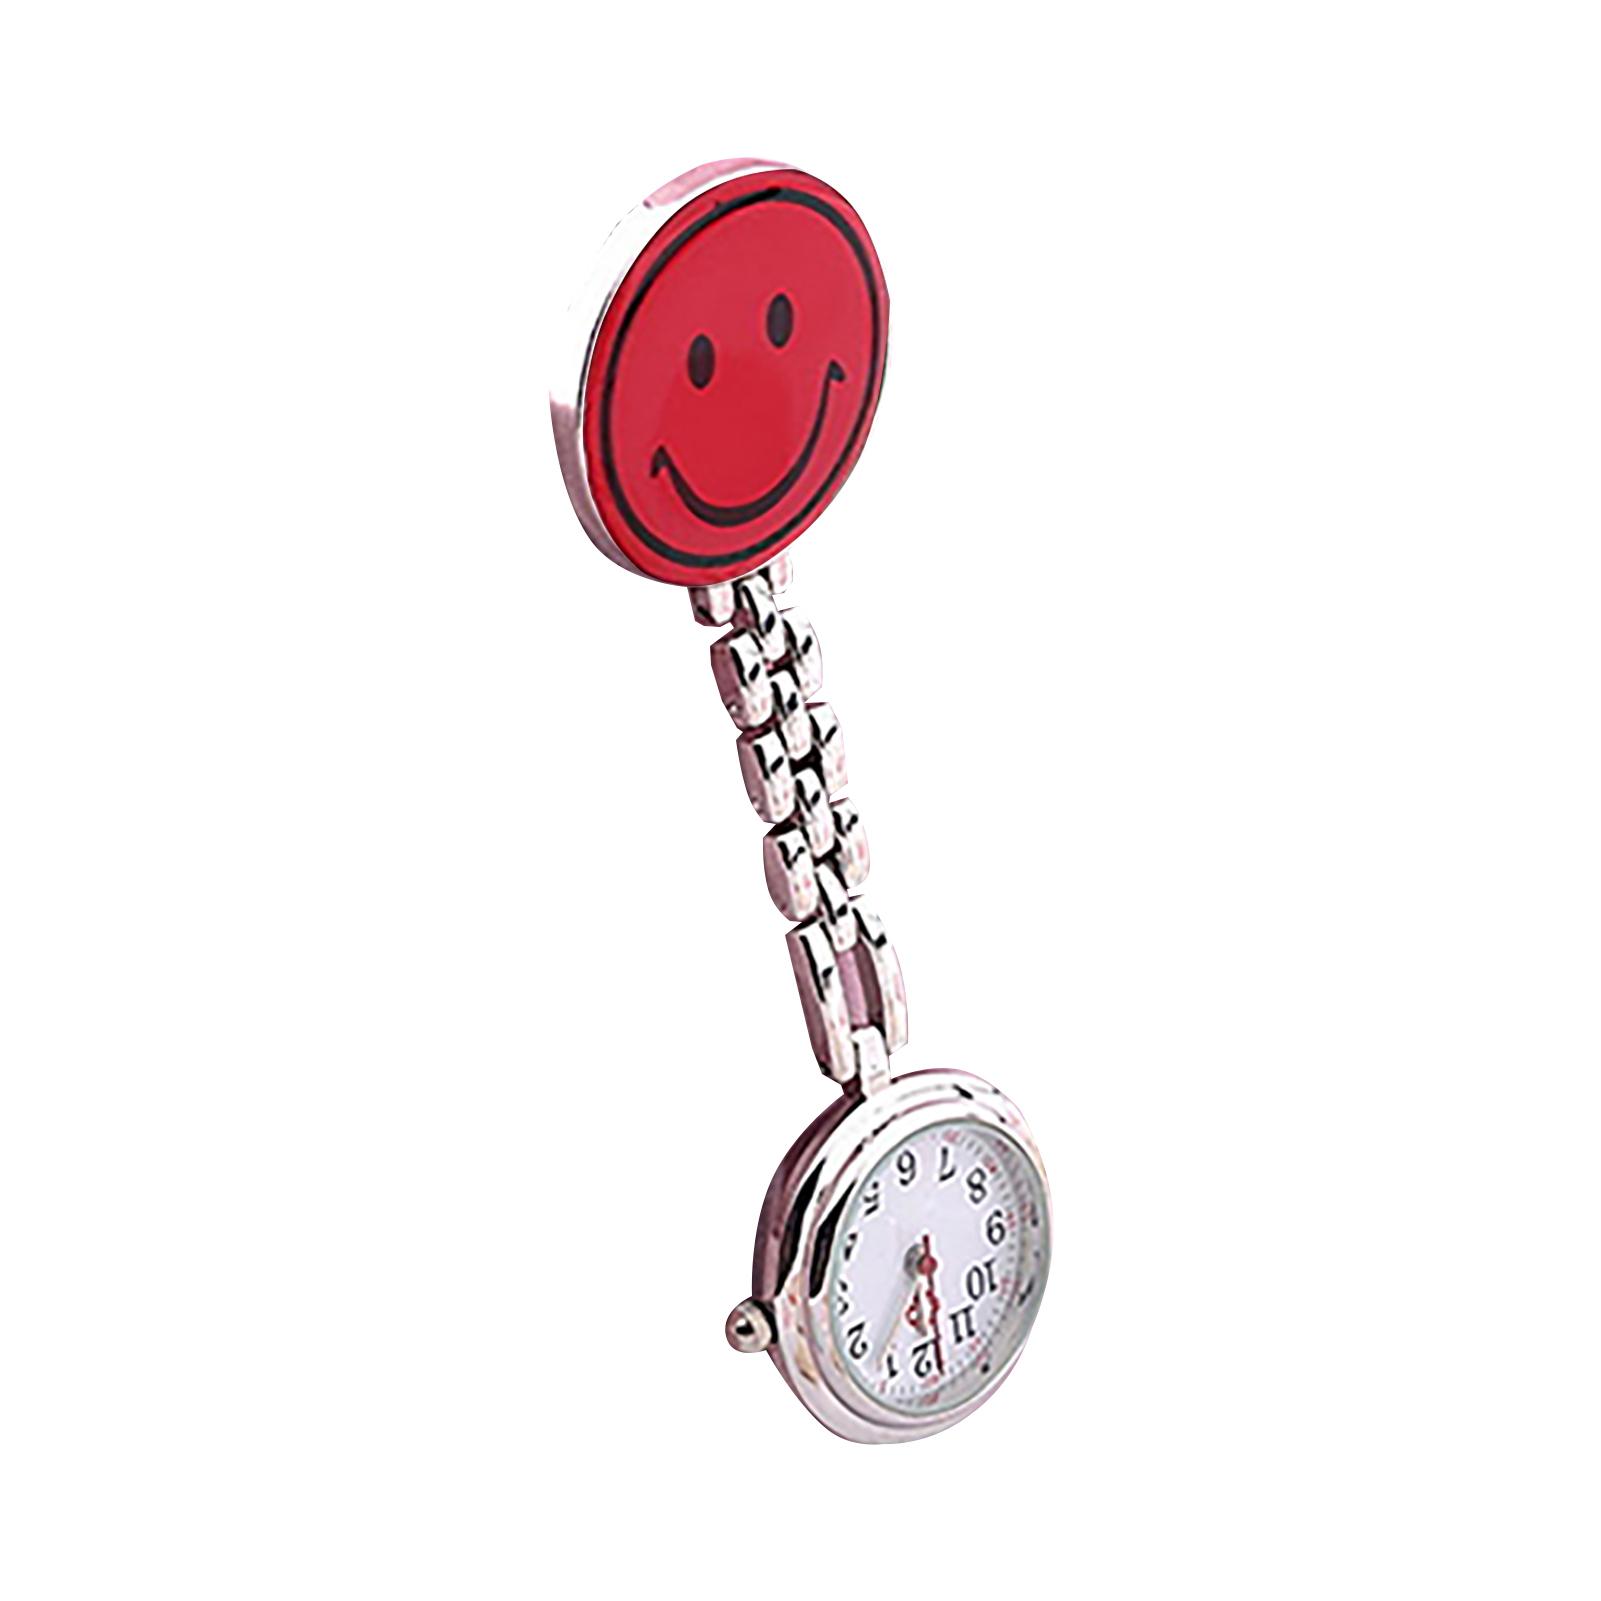 Women-Butterfly-Smile-Face-Analog-Quartz-Clip-On-Brooch-Pocket-Nurse-Watch-Hot thumbnail 14